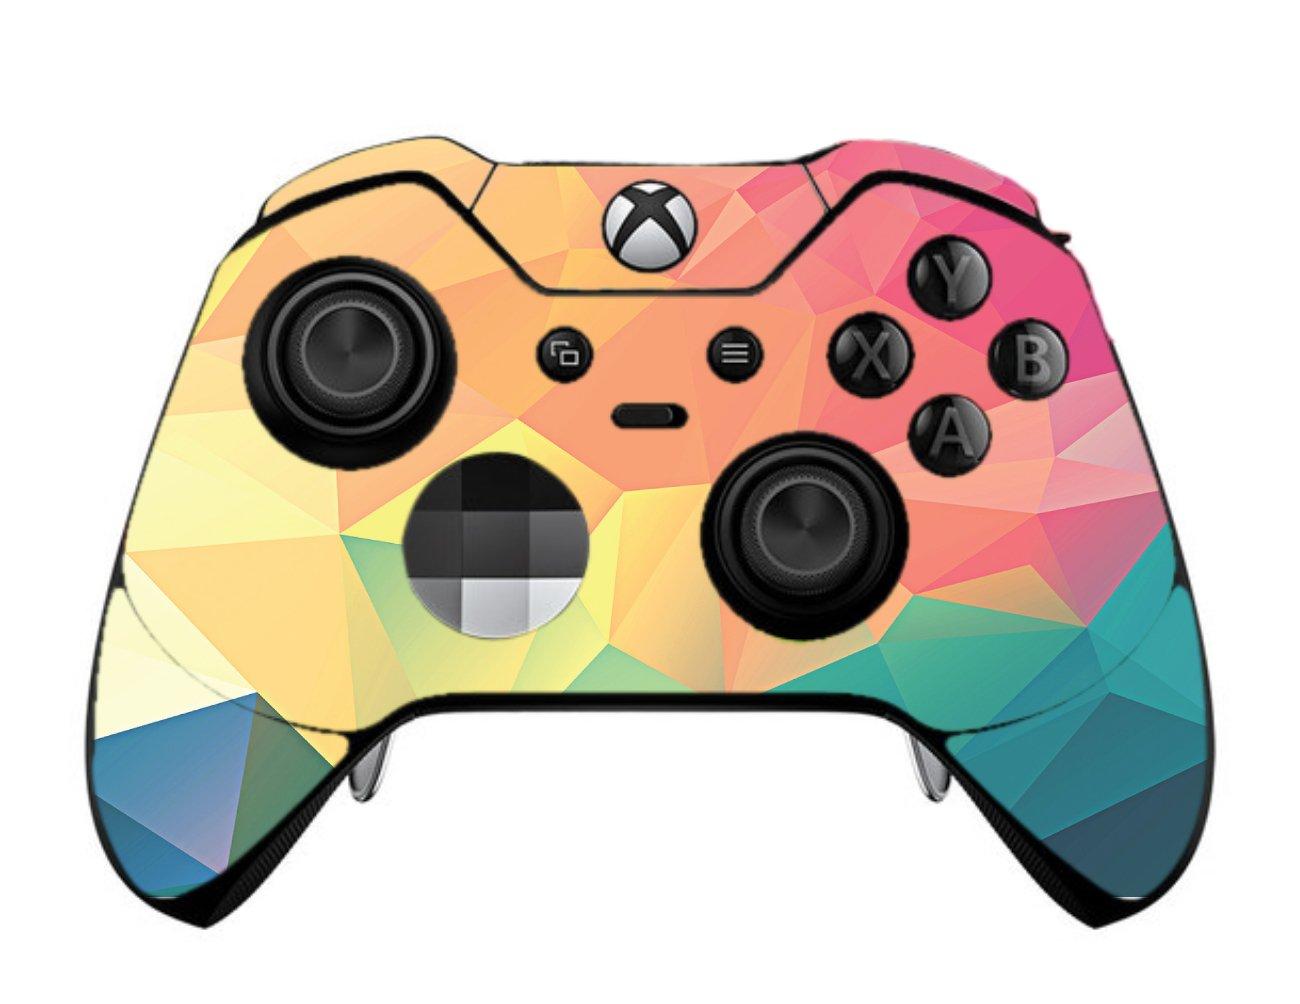 Pastel Rainbow Polygon Design Vinyl Decal Sticker Skin by egeek amz for Xbox One Elite Controller